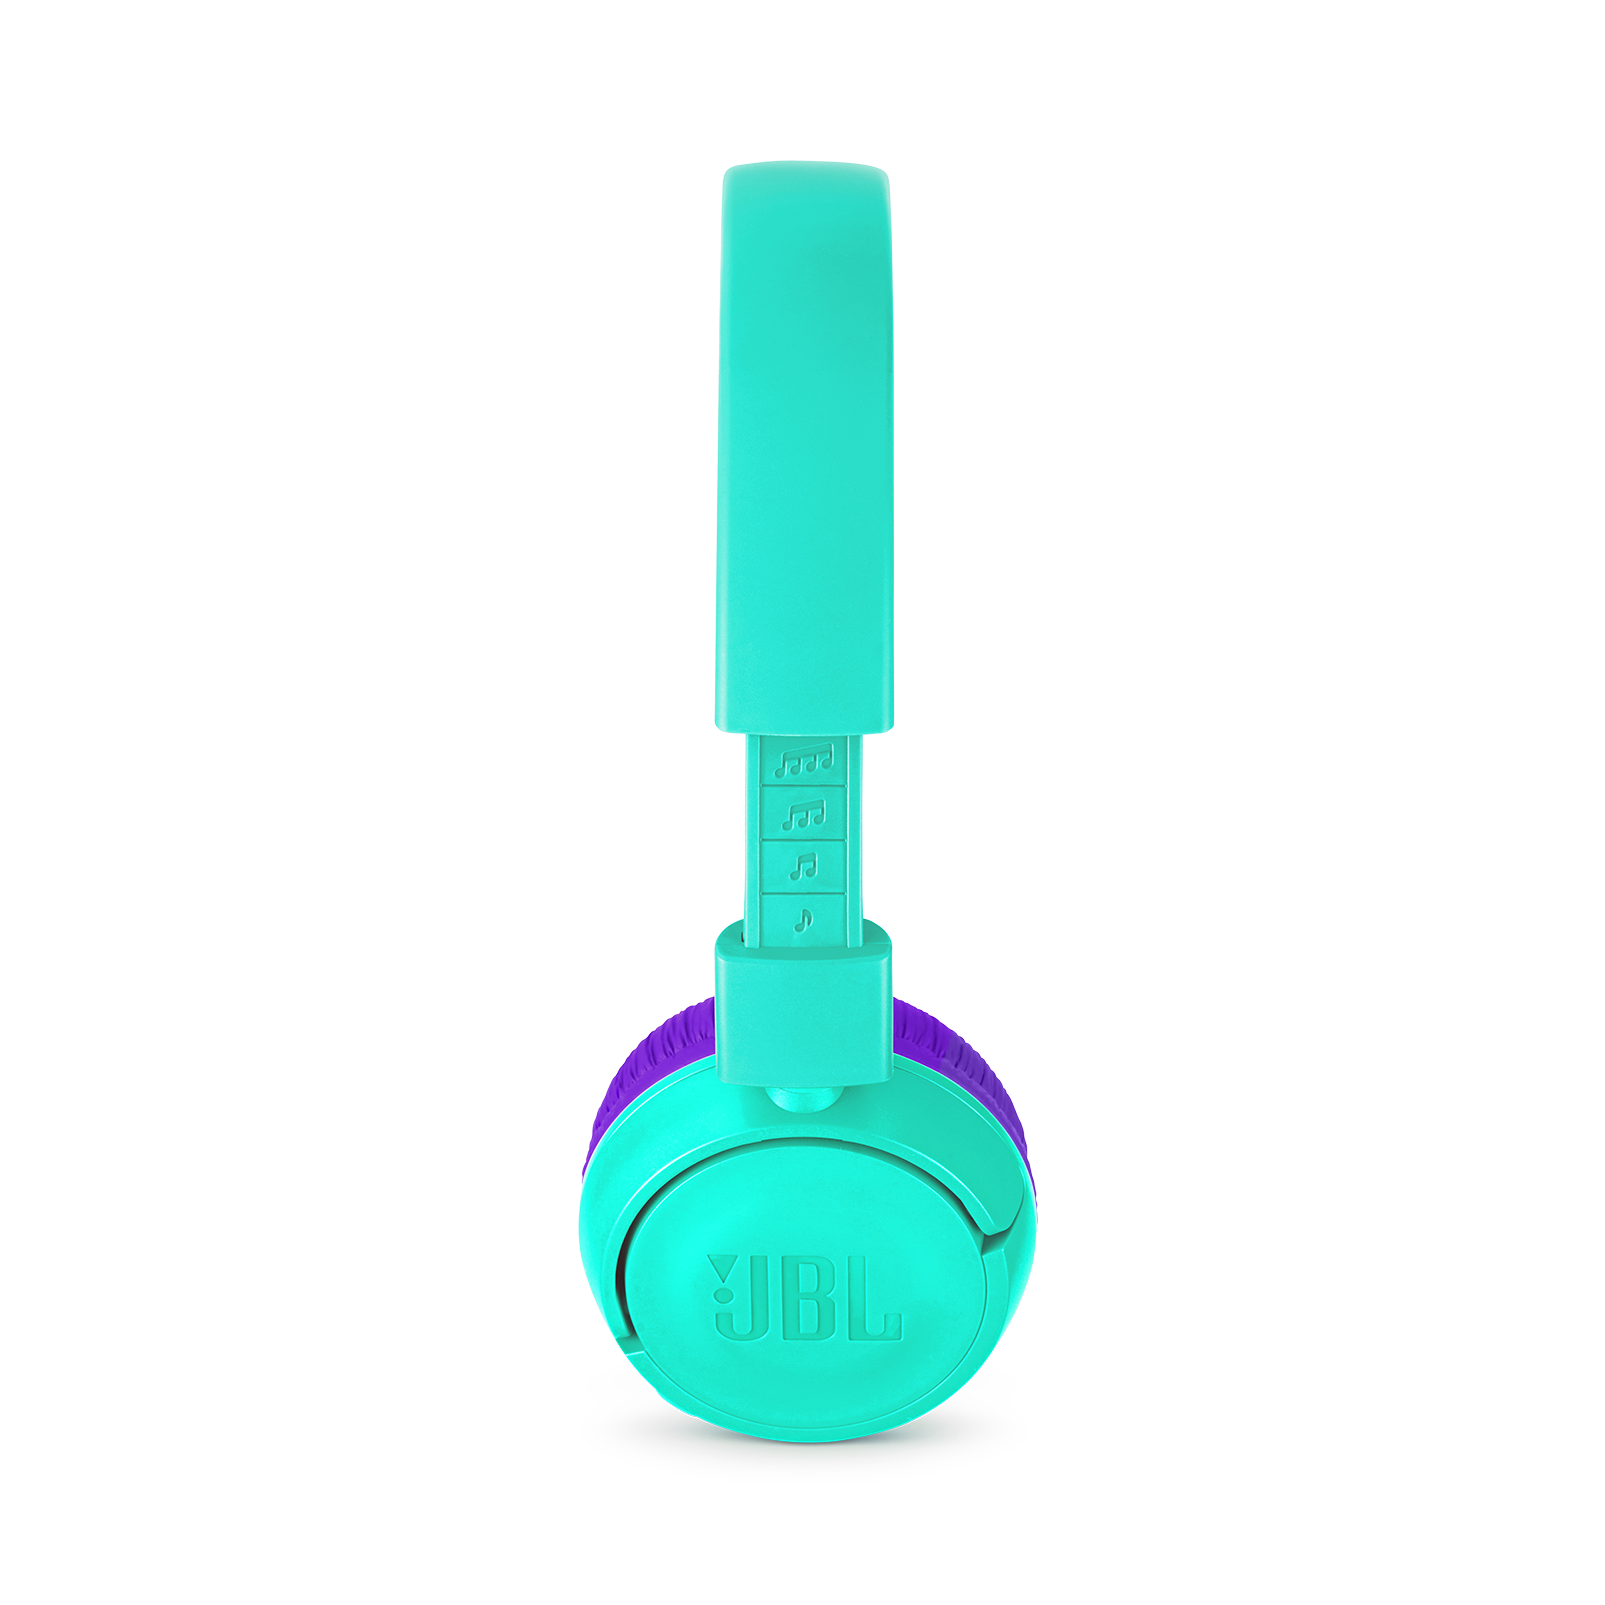 JBL JR300BT - Teal - Kids Wireless on-ear headphones - Detailshot 1